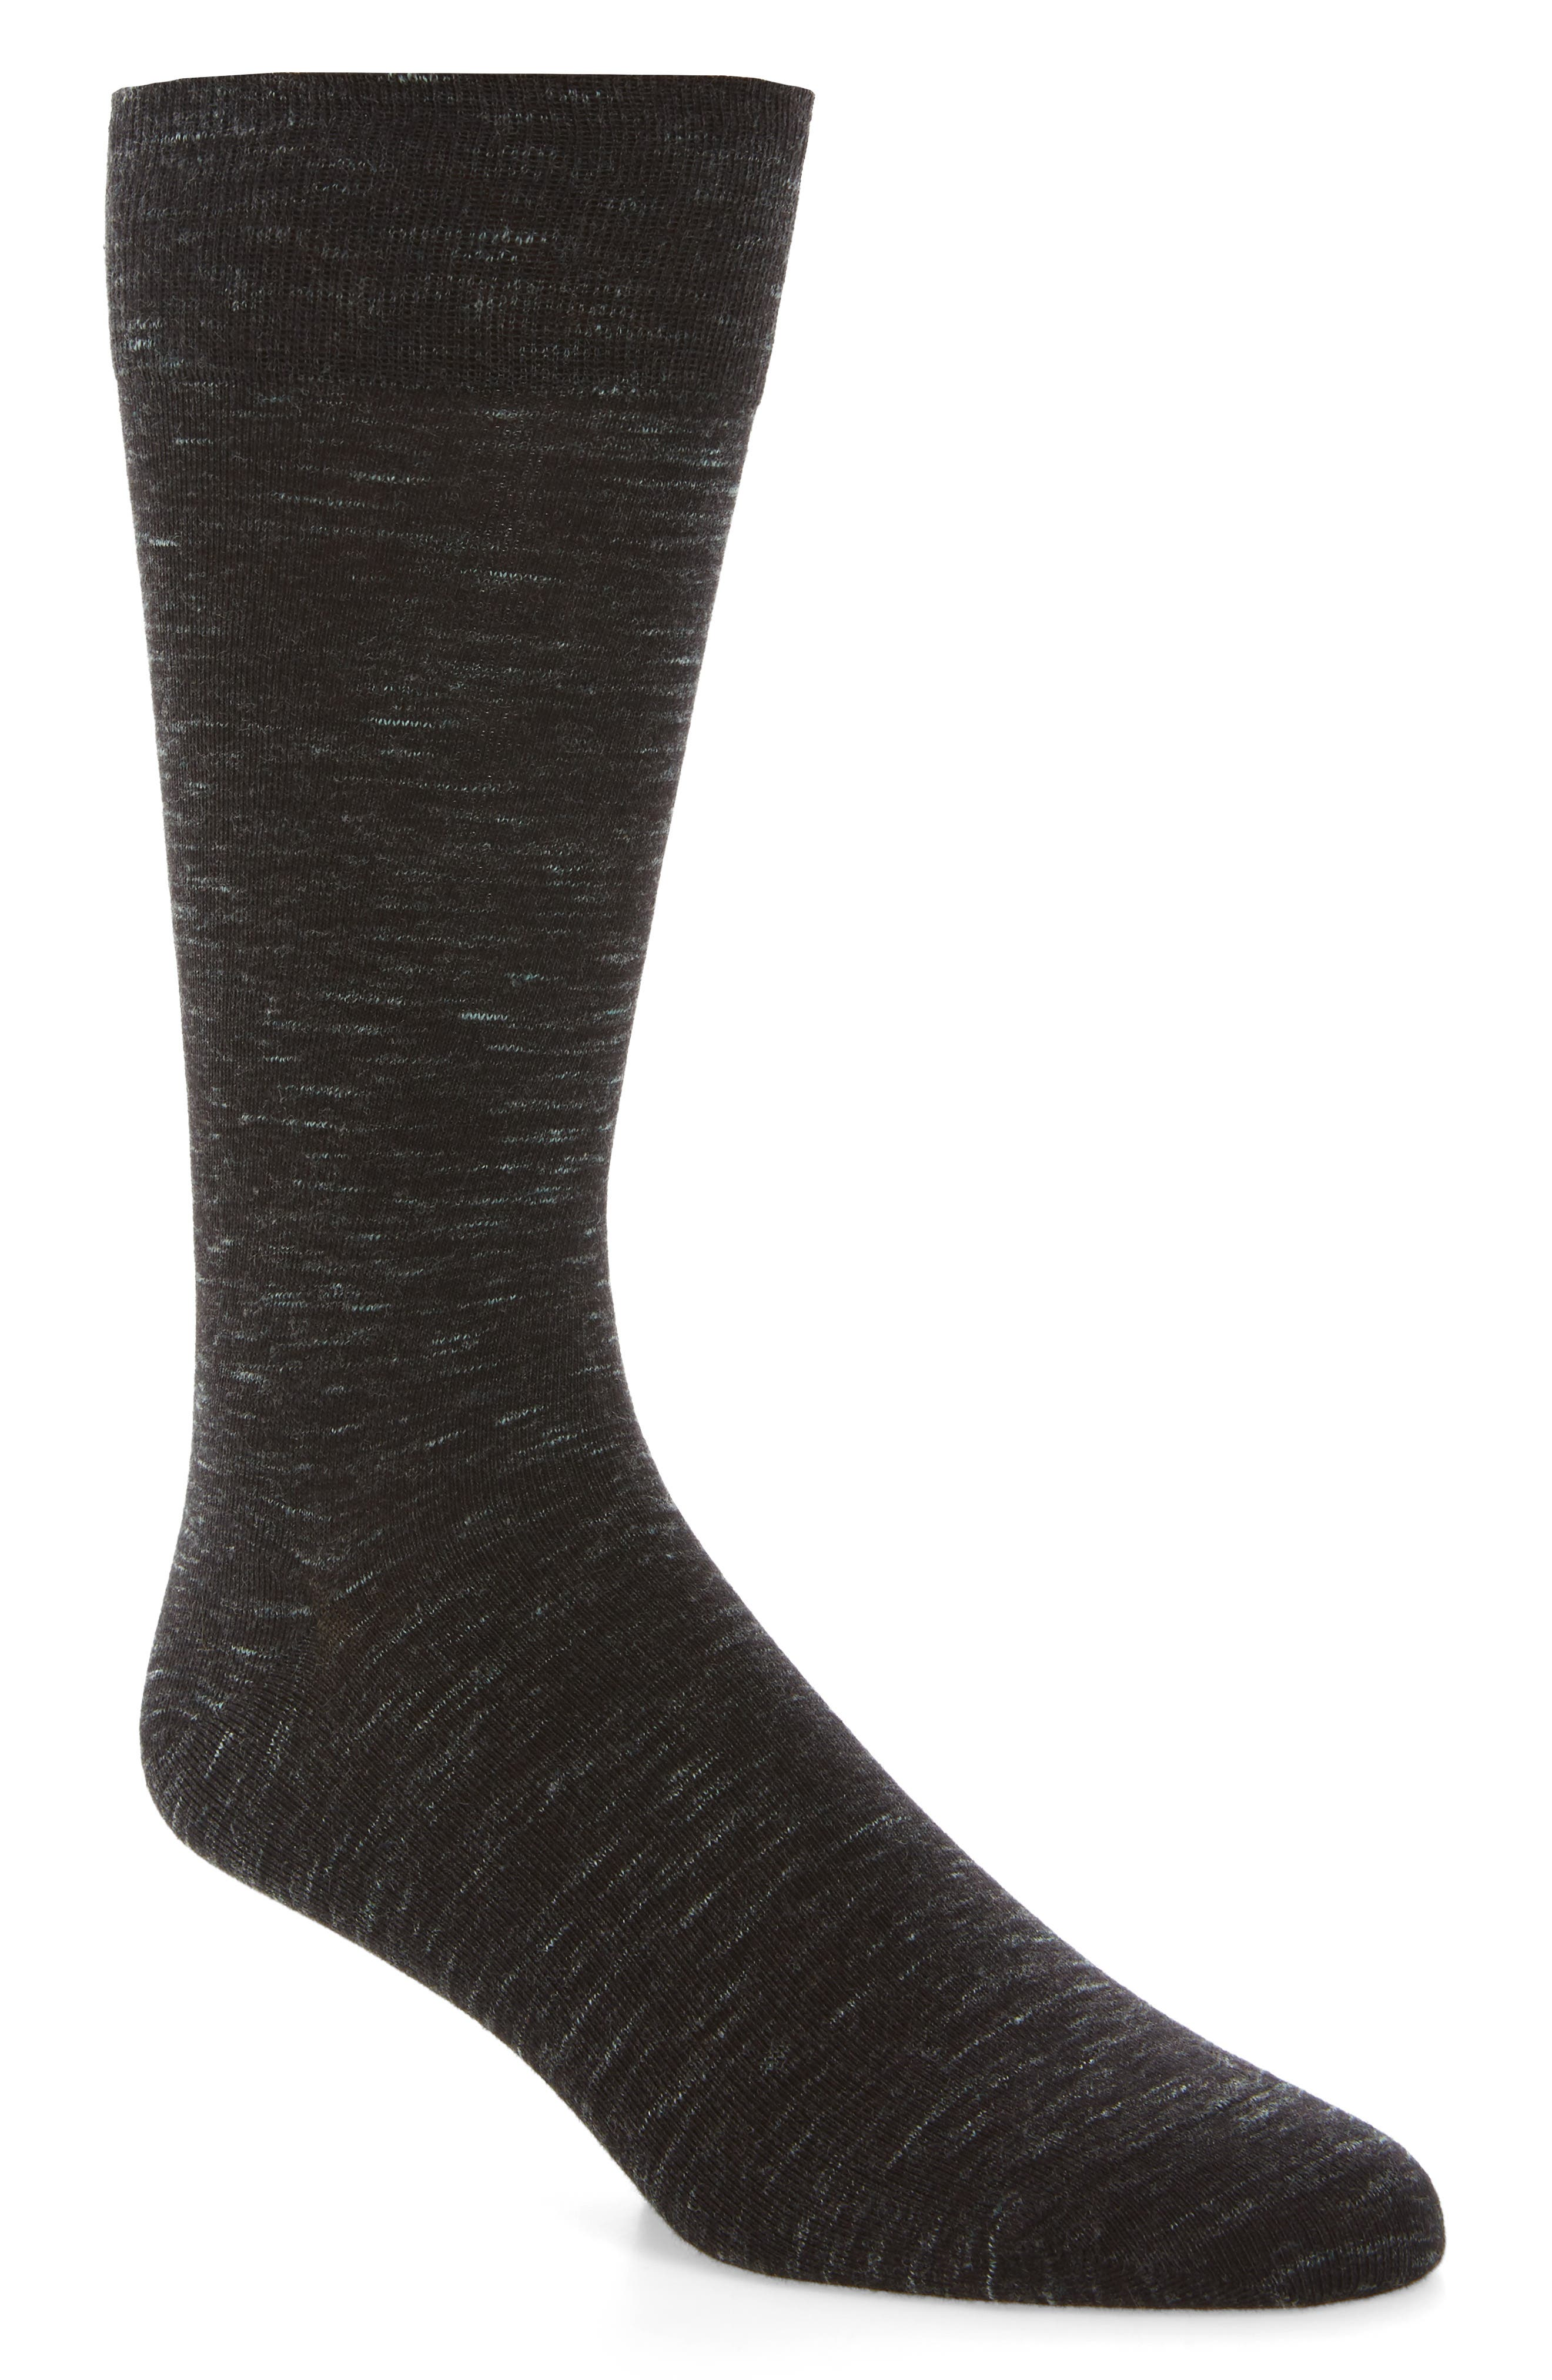 Twist Socks,                             Main thumbnail 1, color,                             BLACK